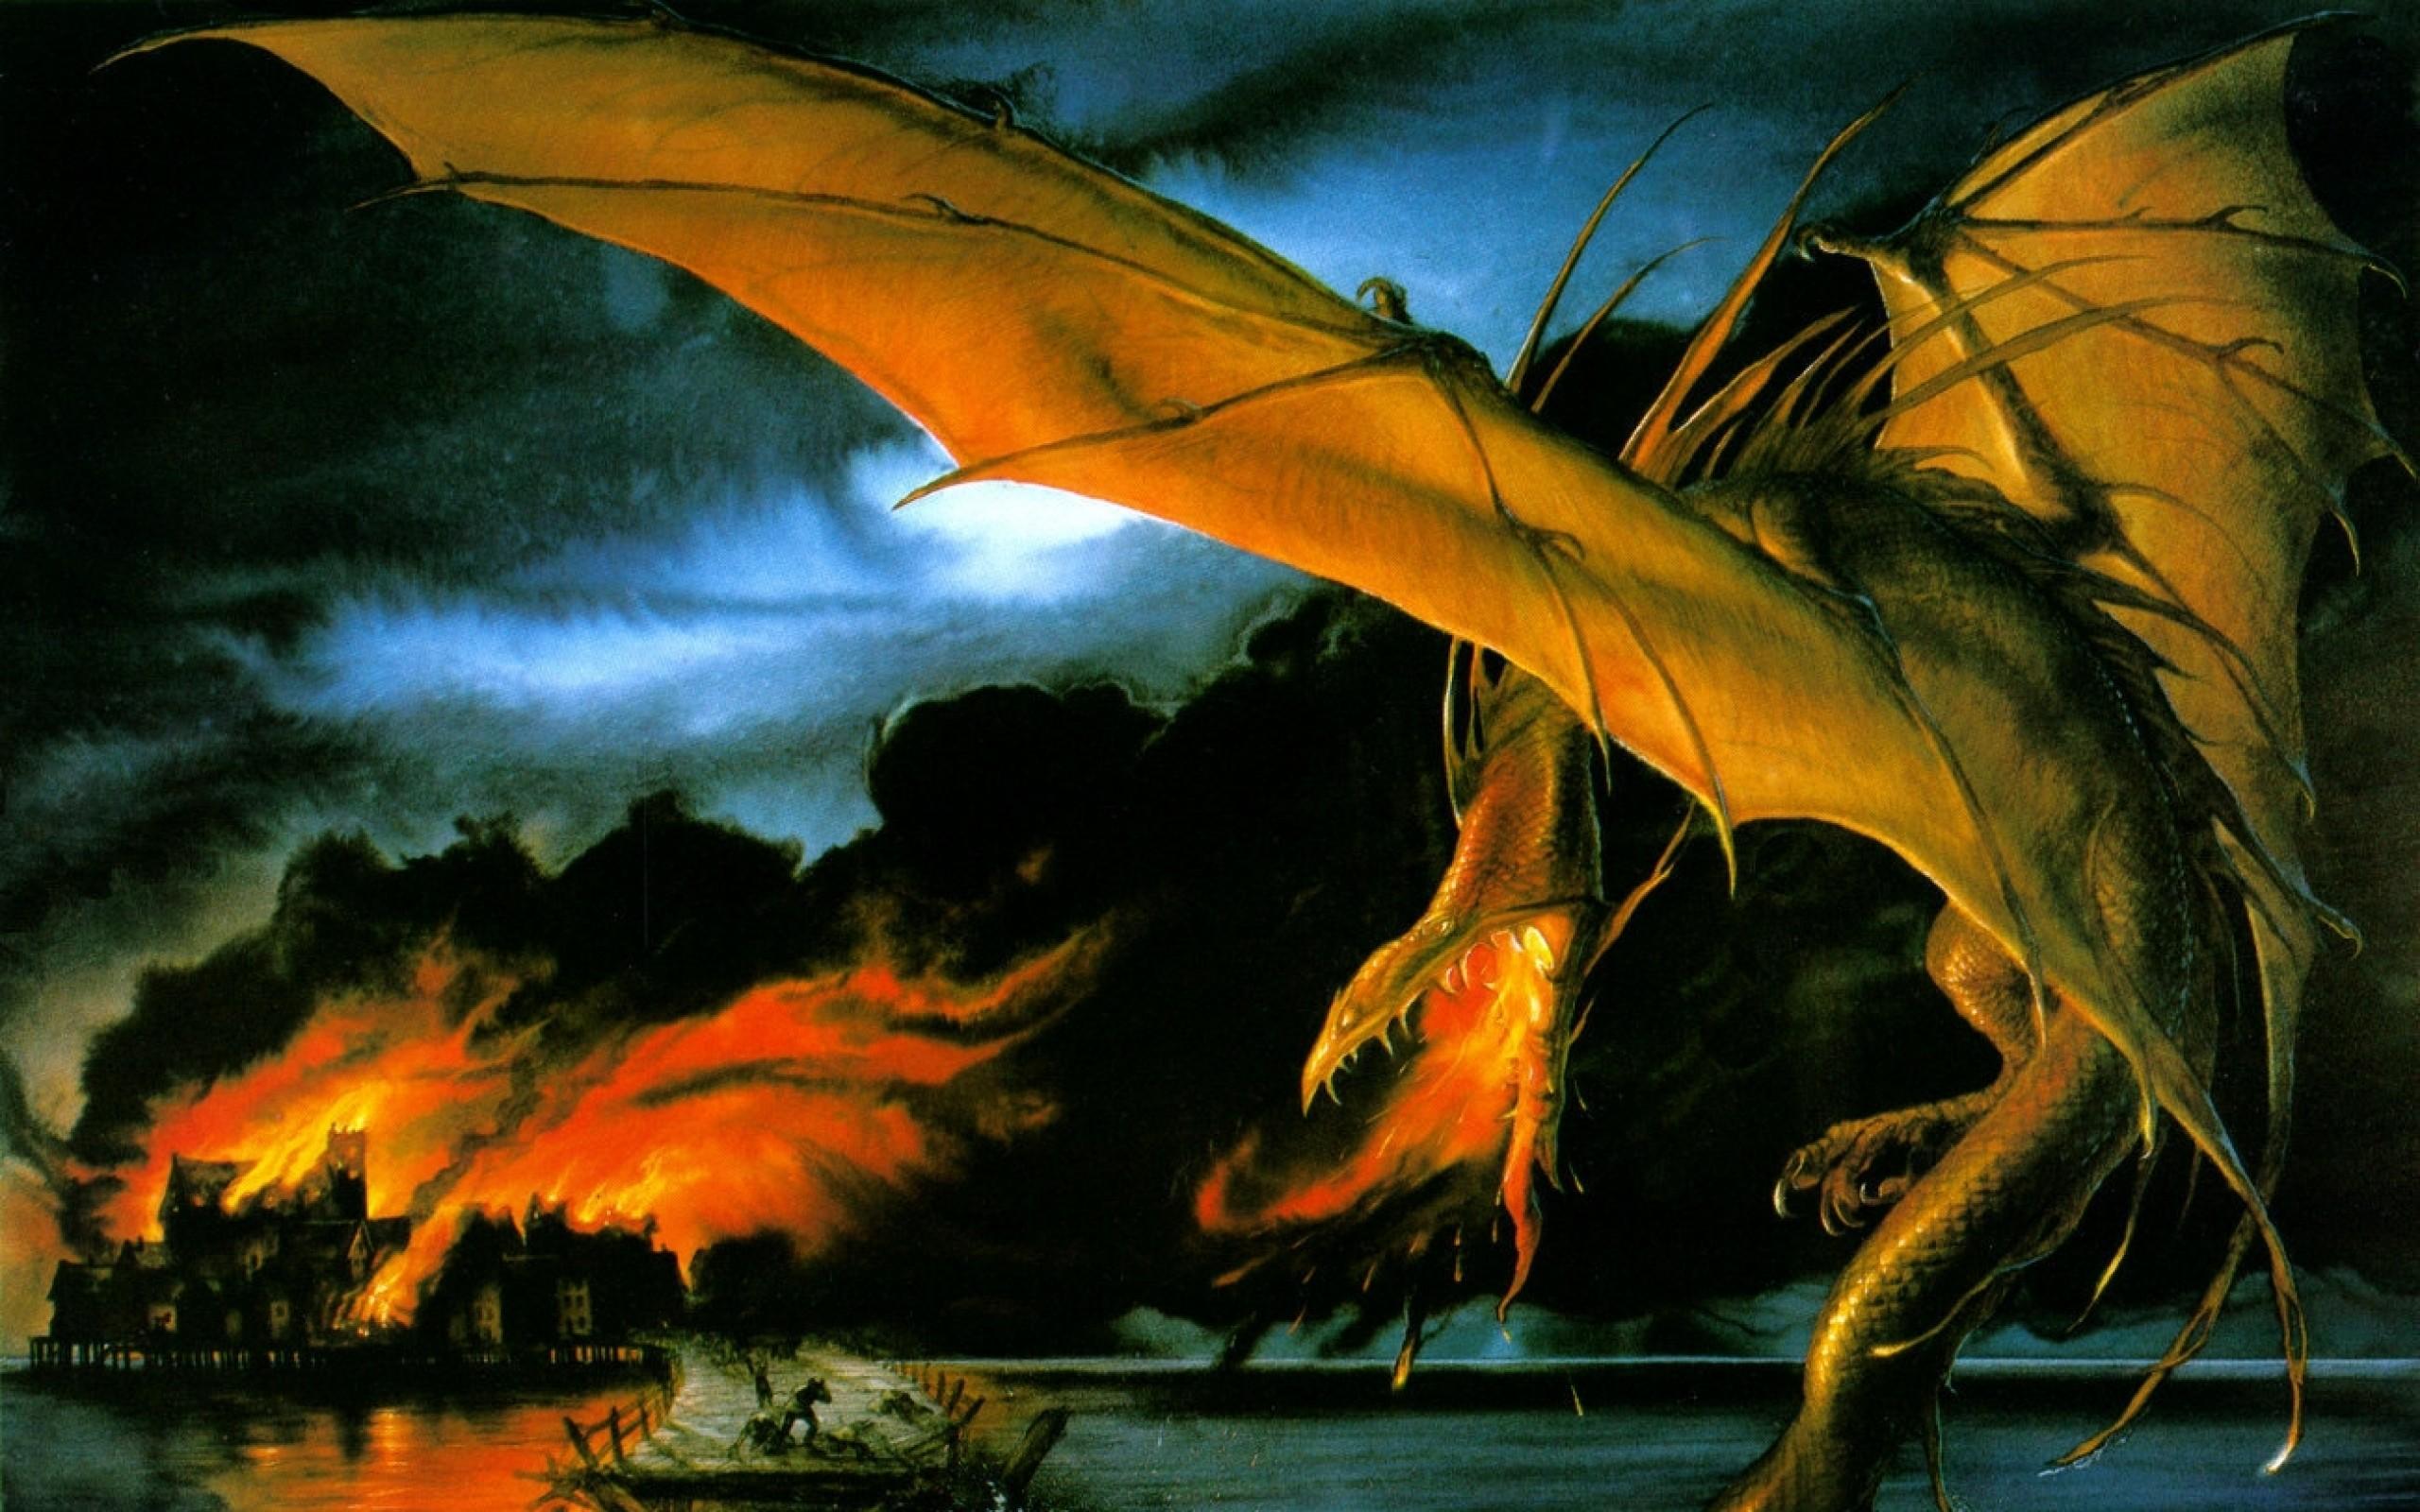 dragons fantasy art jrr tolkien smaug john howe 1300×969 wallpaper Art HD  Wallpaper